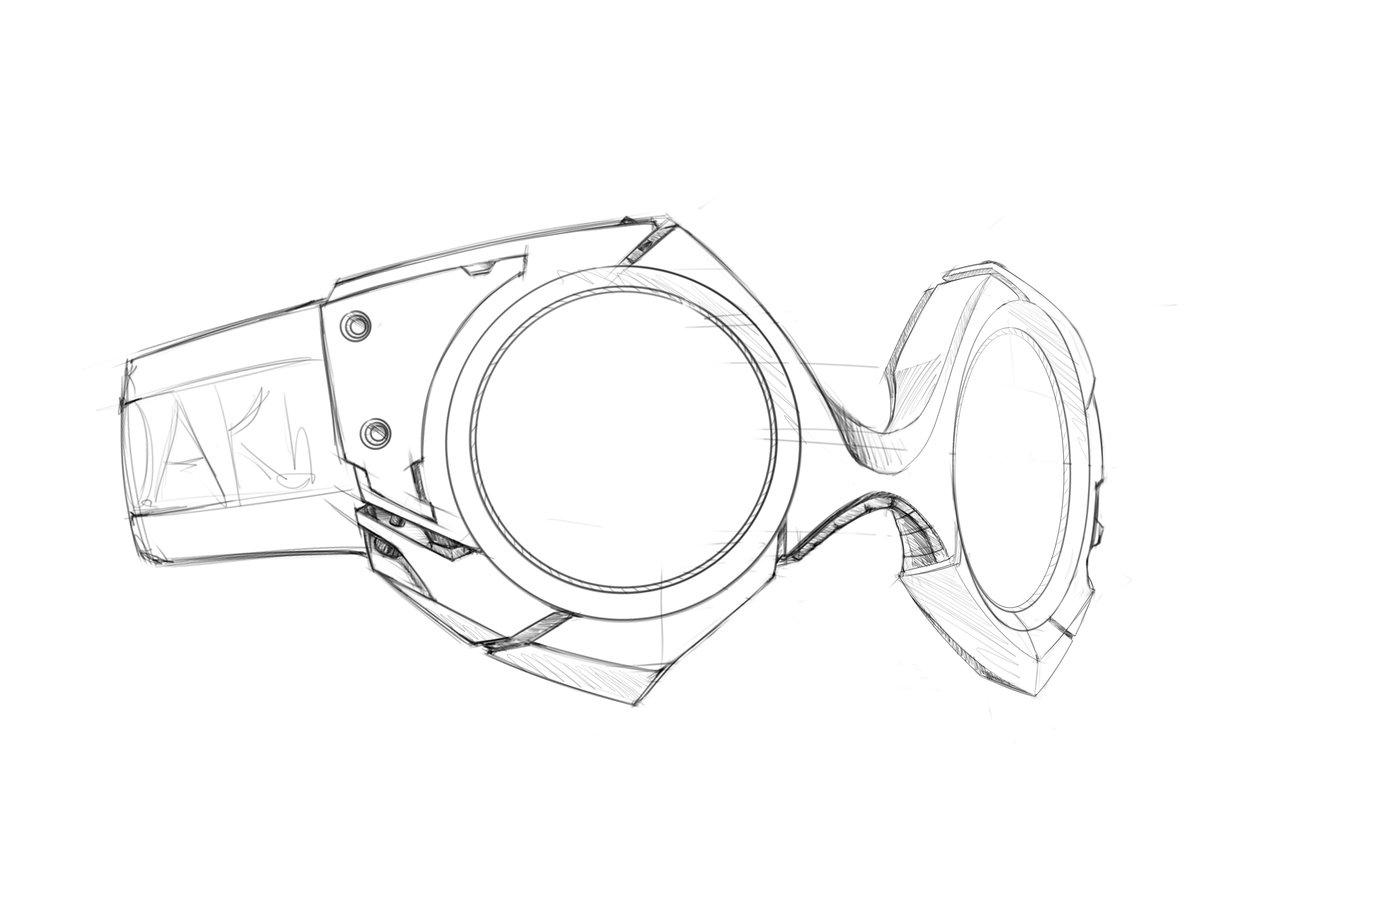 Oakley Concepts by Scott Martin at Coroflot.com